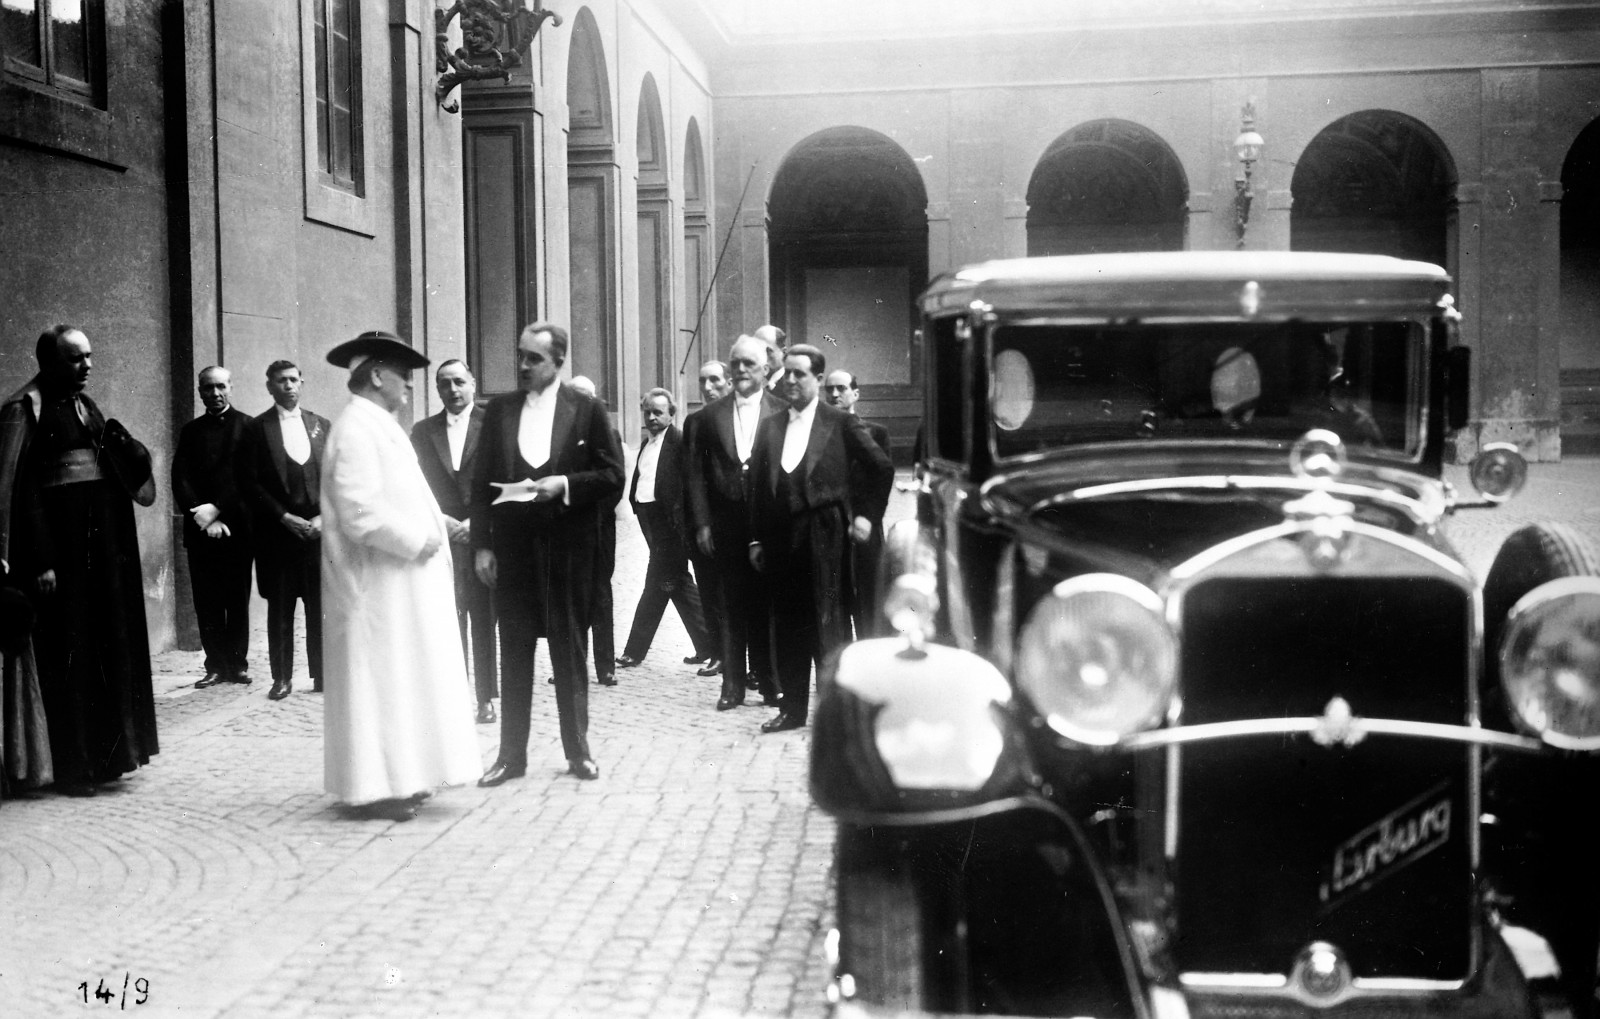 Påven Pius XI och hans Mercedes-Benz Nürburg 460 1930.